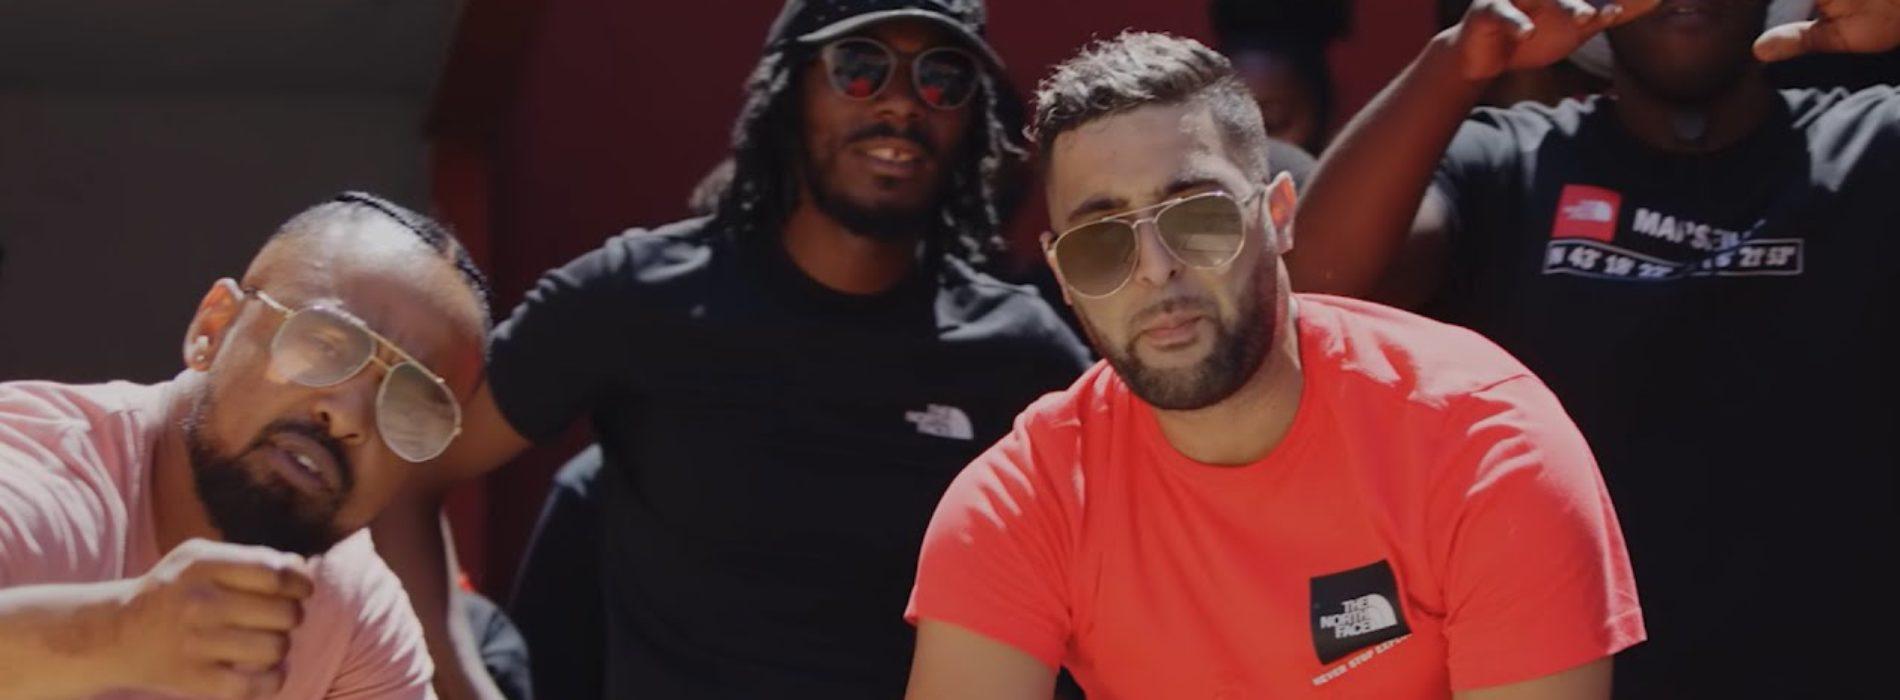 Ghetto Phénomène feat. Alonzo – Benef Benef (Clip Officiel) – Octobre 2020